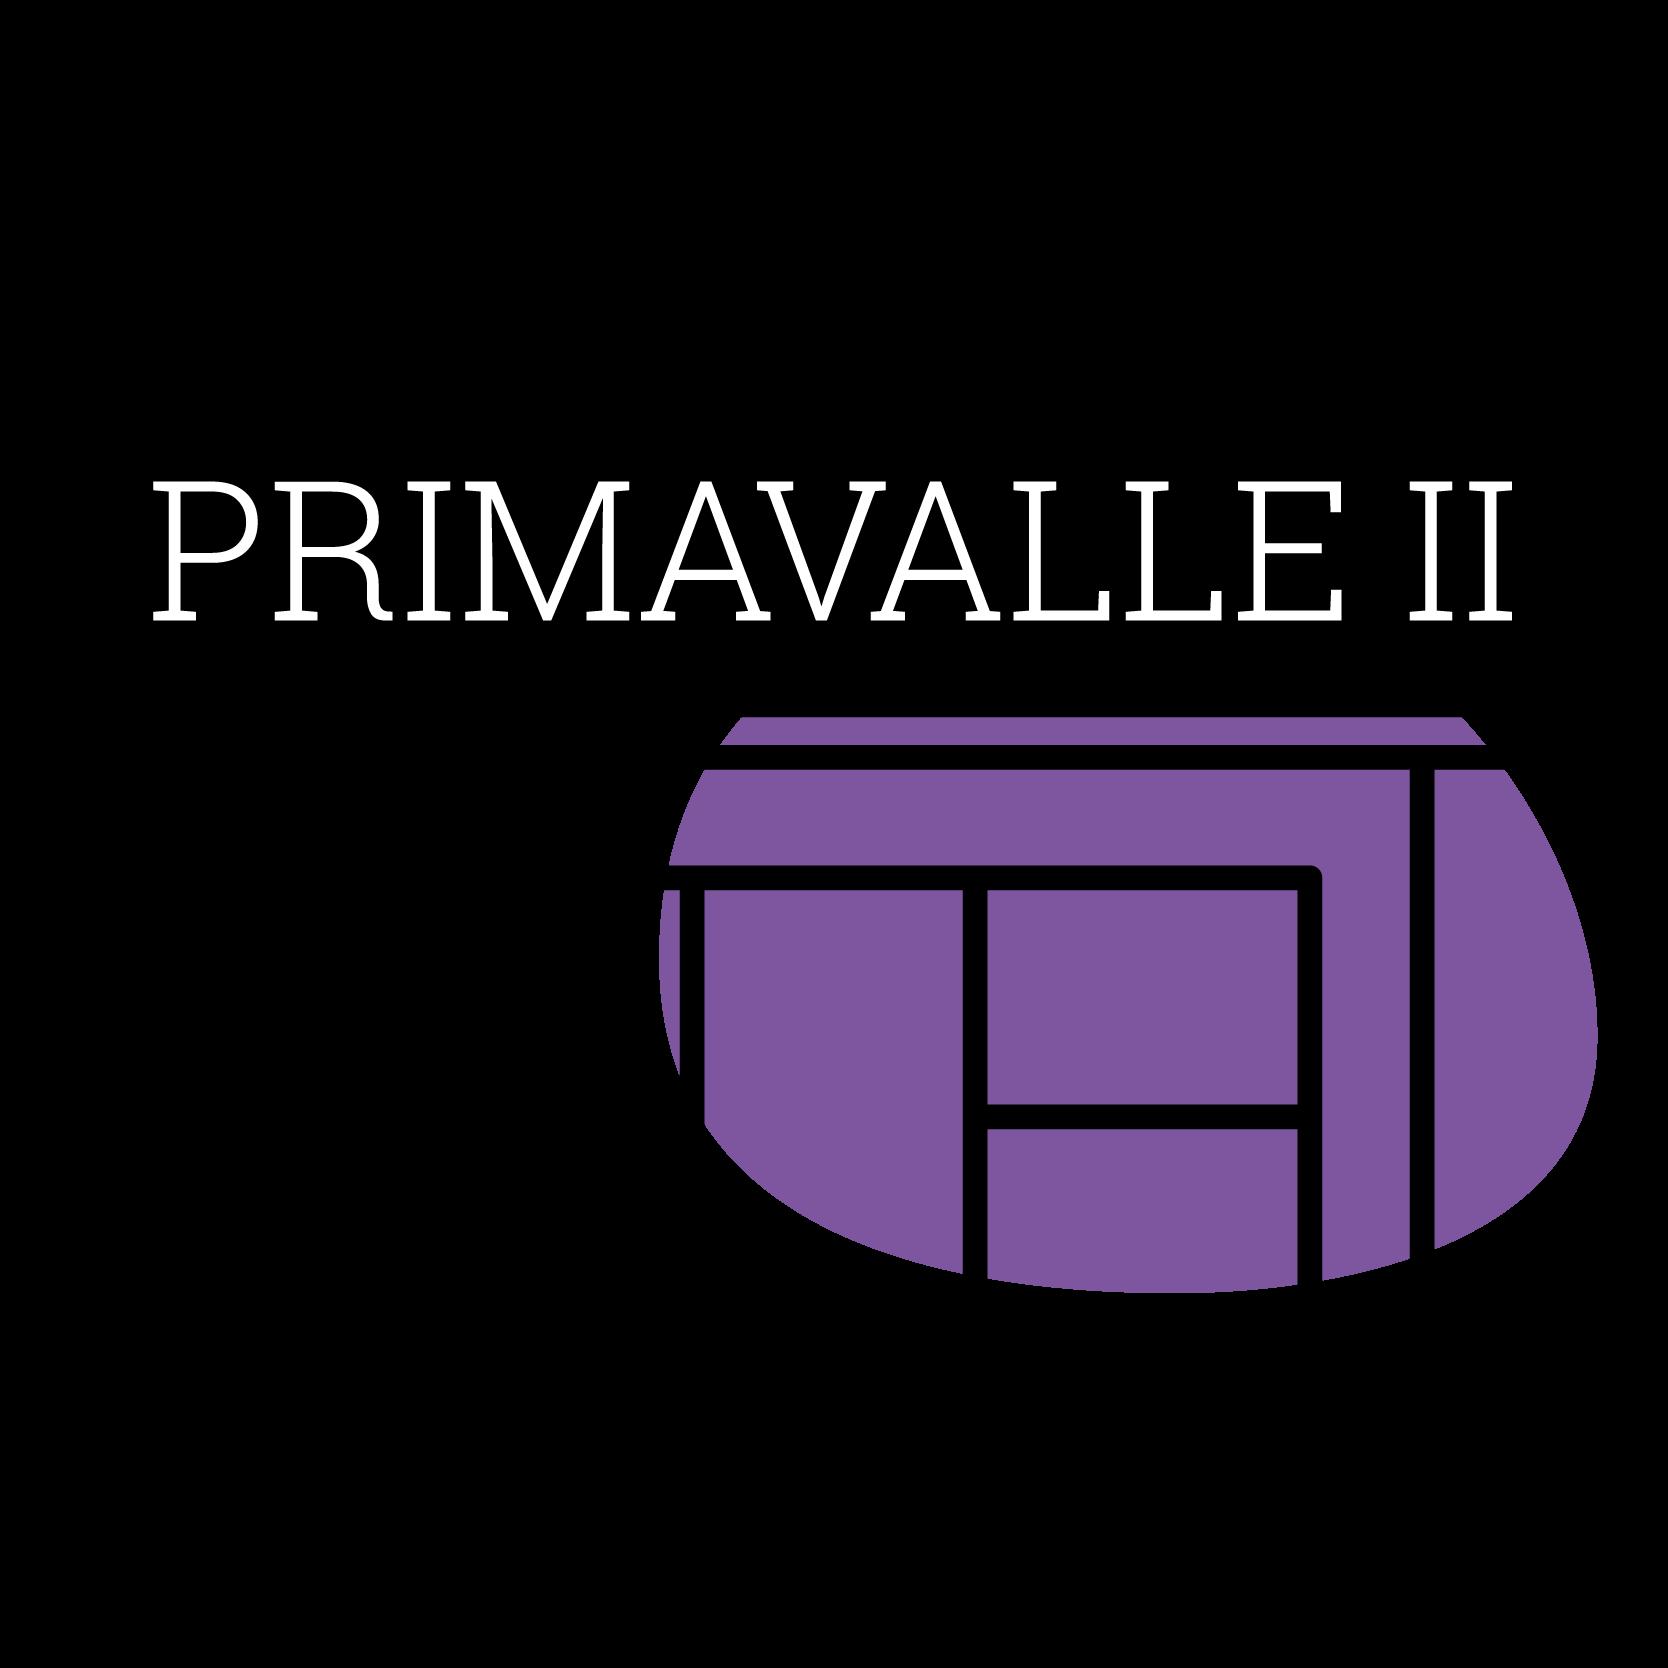 mercato primavalle II roma